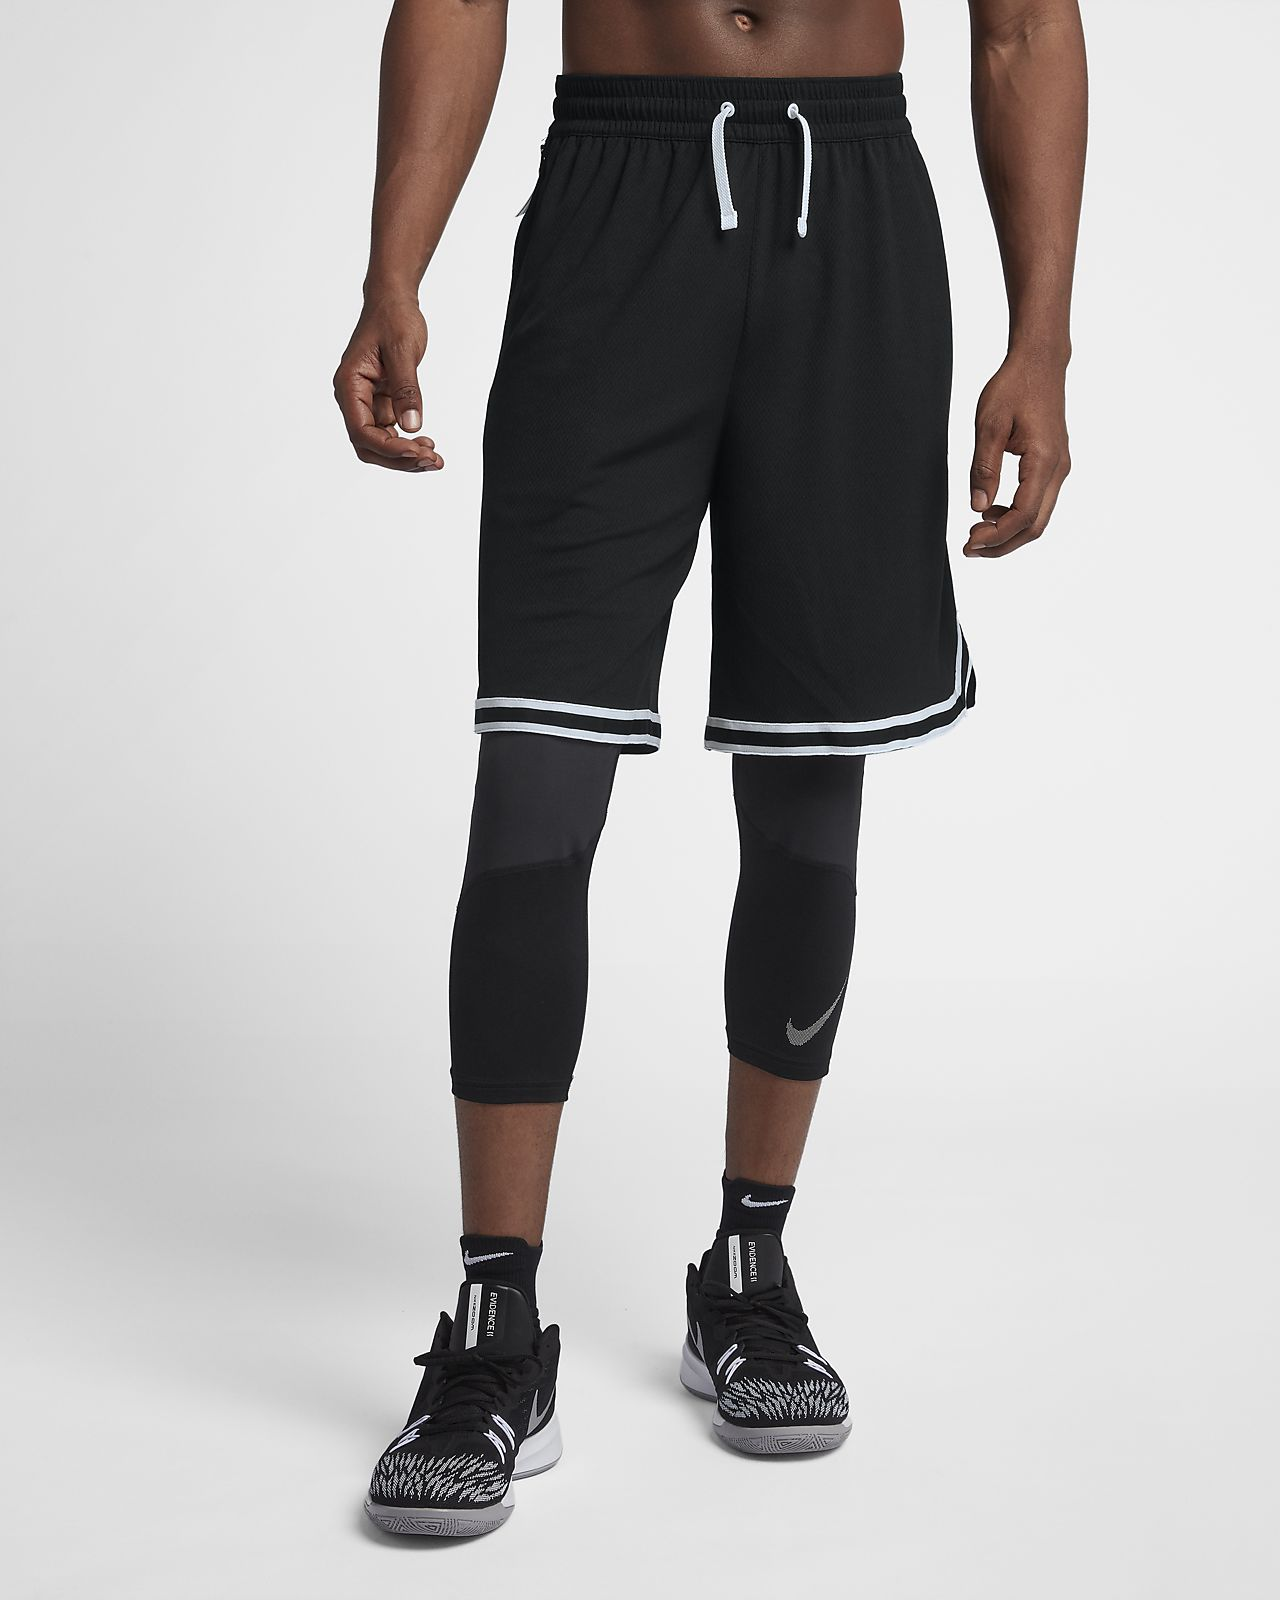 online store 46907 a80d0 ... Nike Dri-FIT DNA Erkek Basketbol Şortu